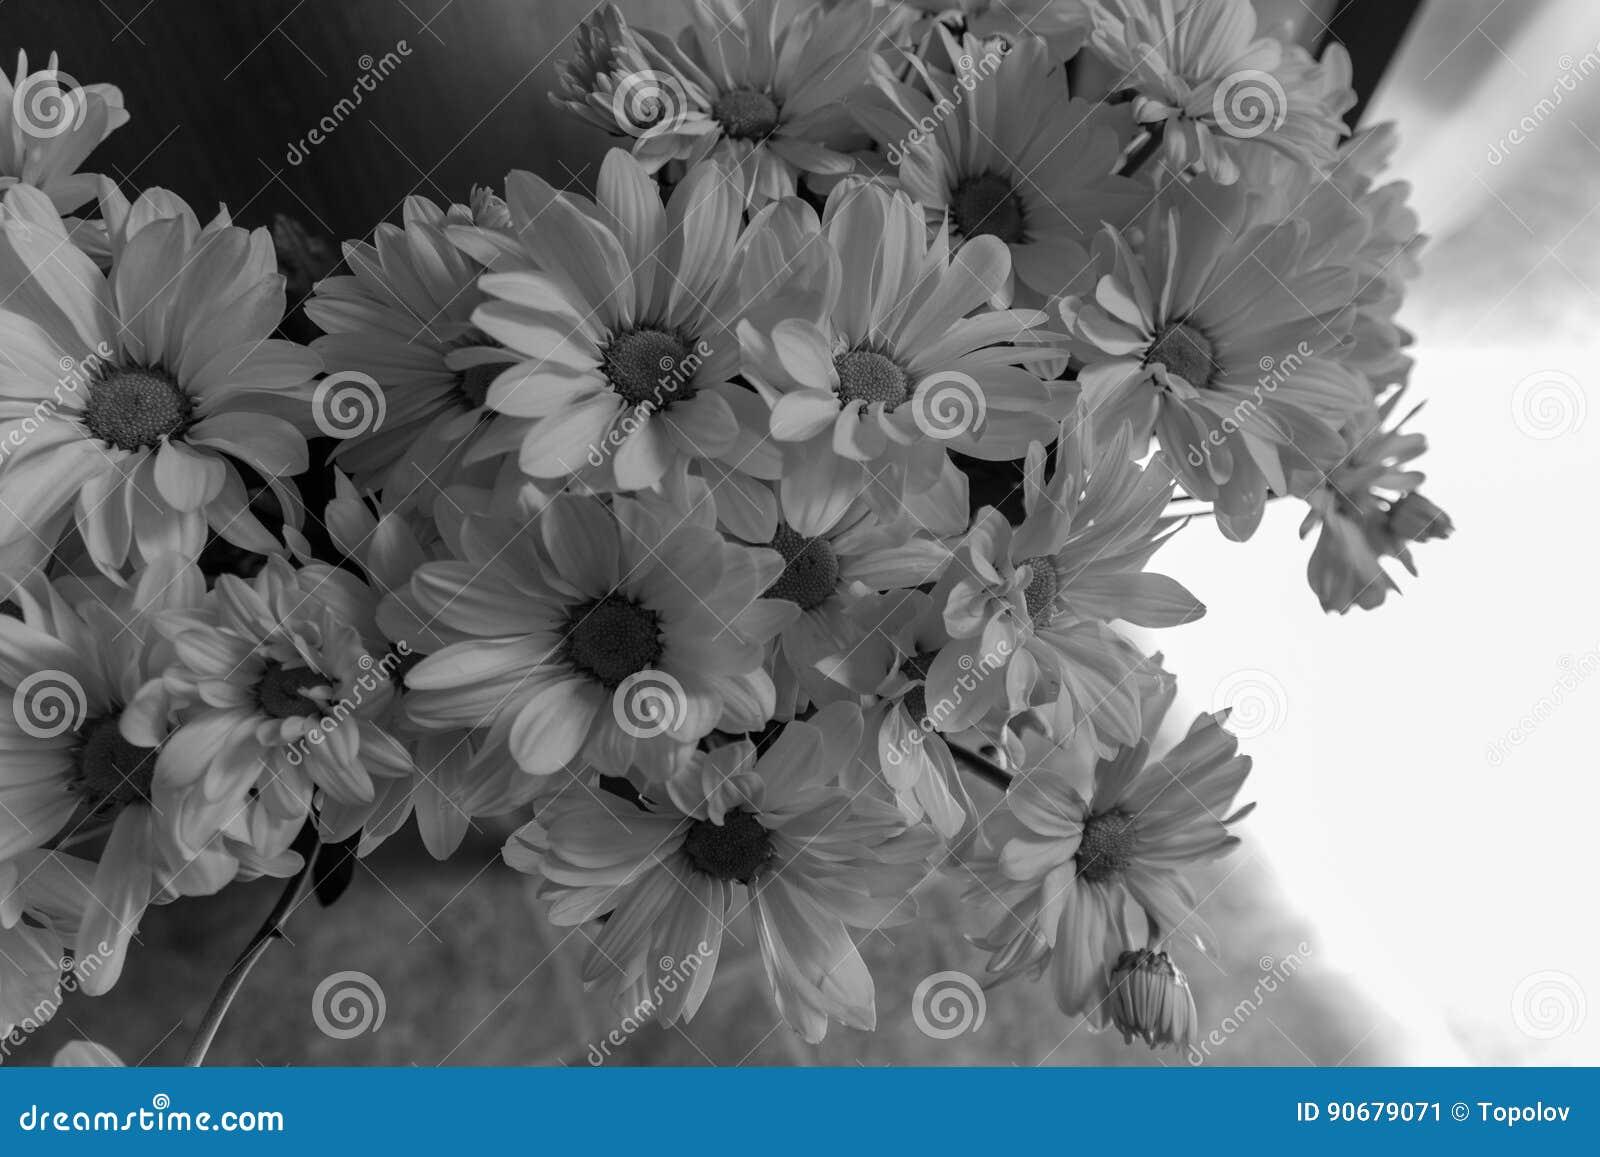 Black And White Chrysanthemum Flowers Stock Image Image Of Vivid